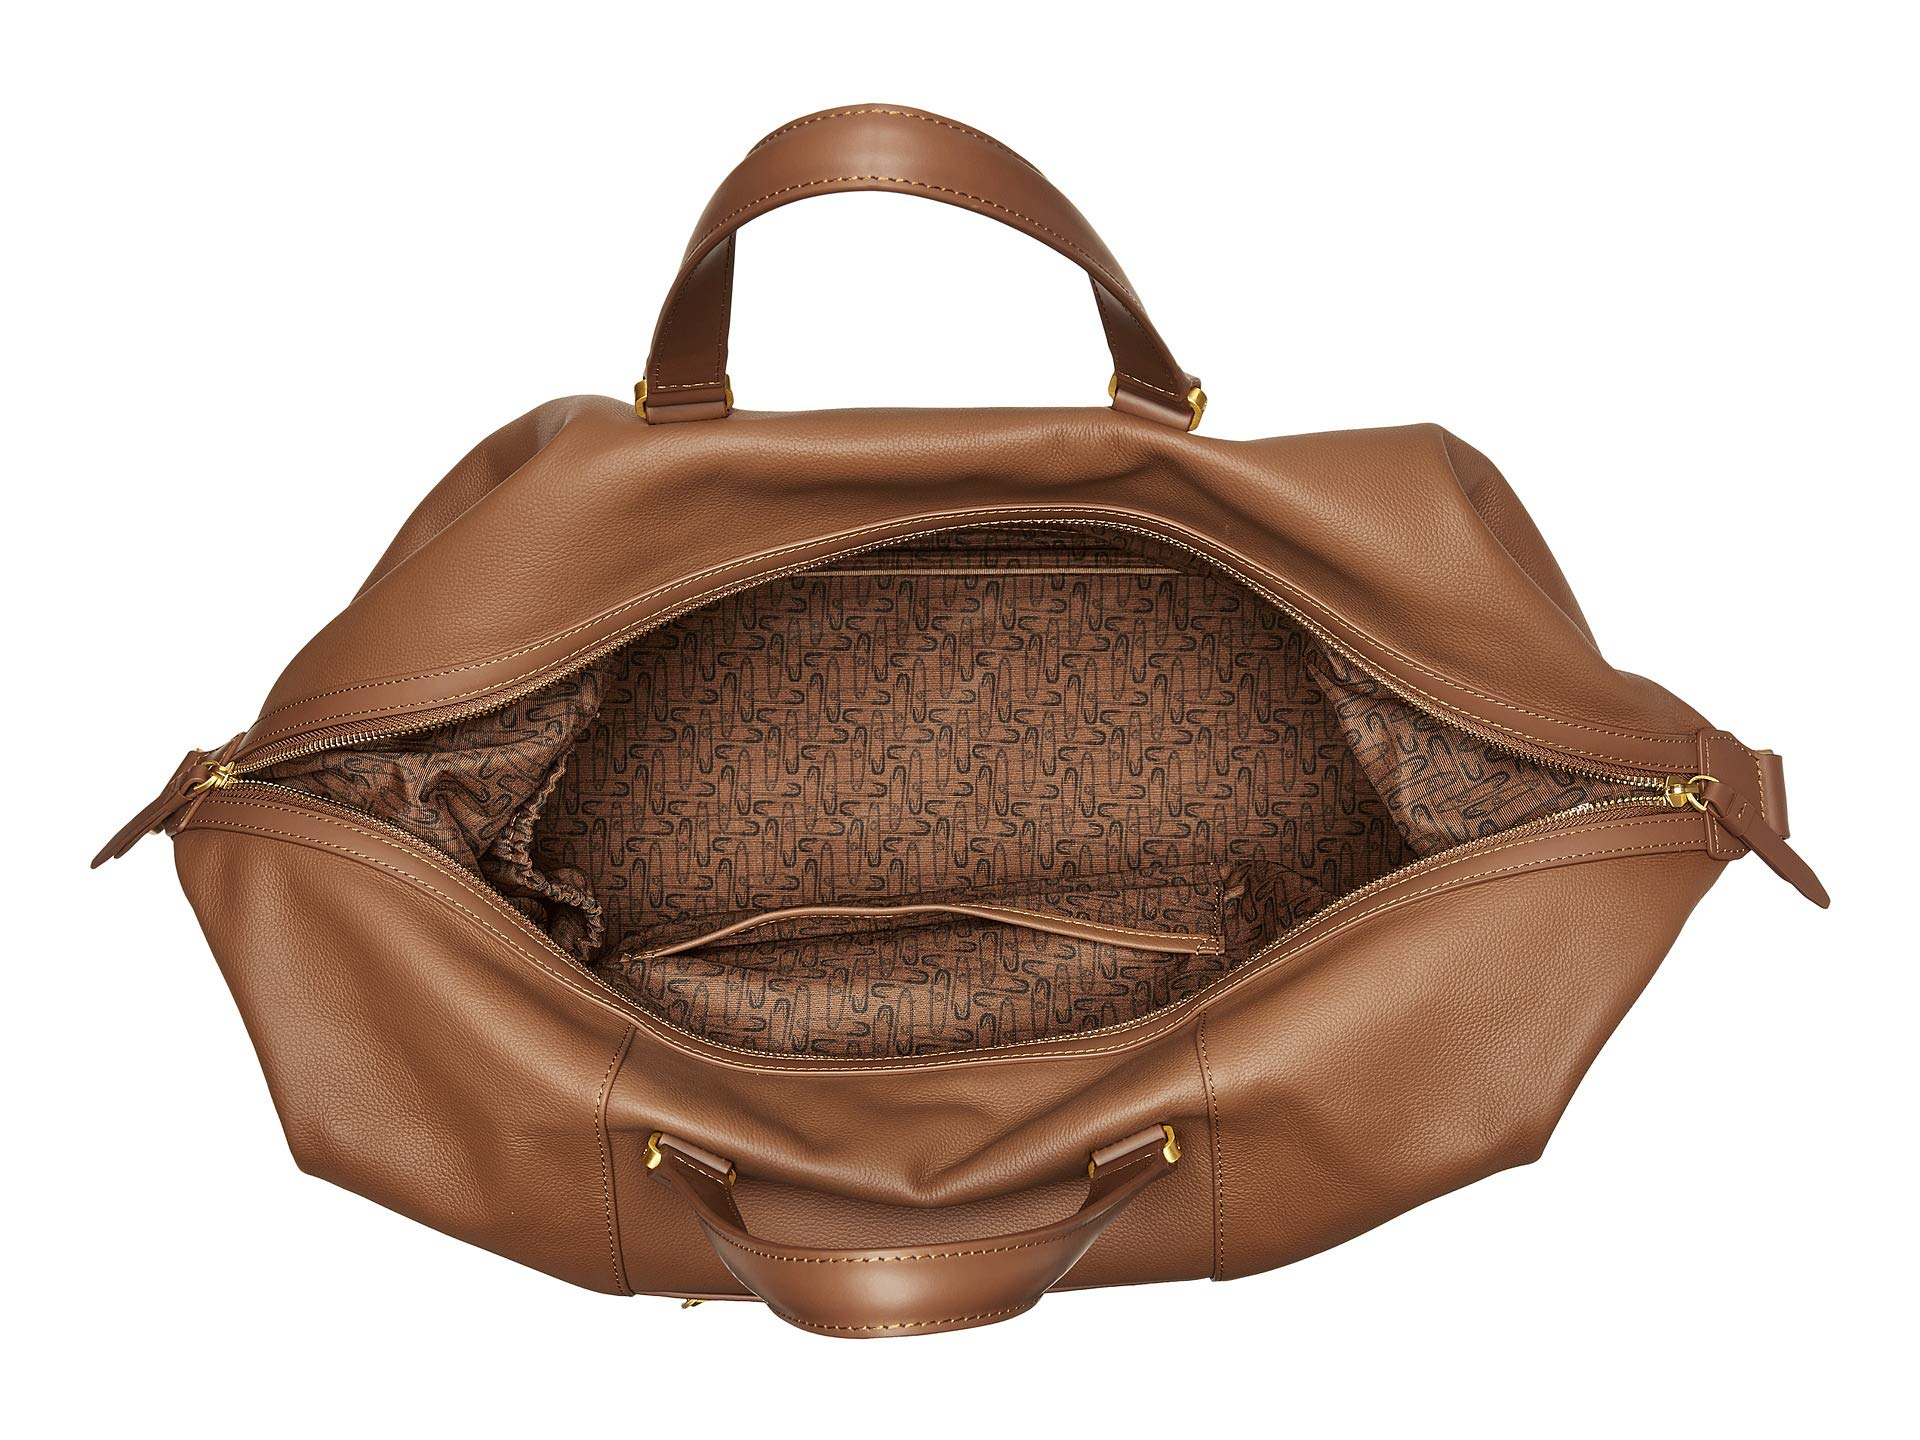 Lipault Bag Cognac Elegance Leather Plume Weekend Paris XwBqZrpX